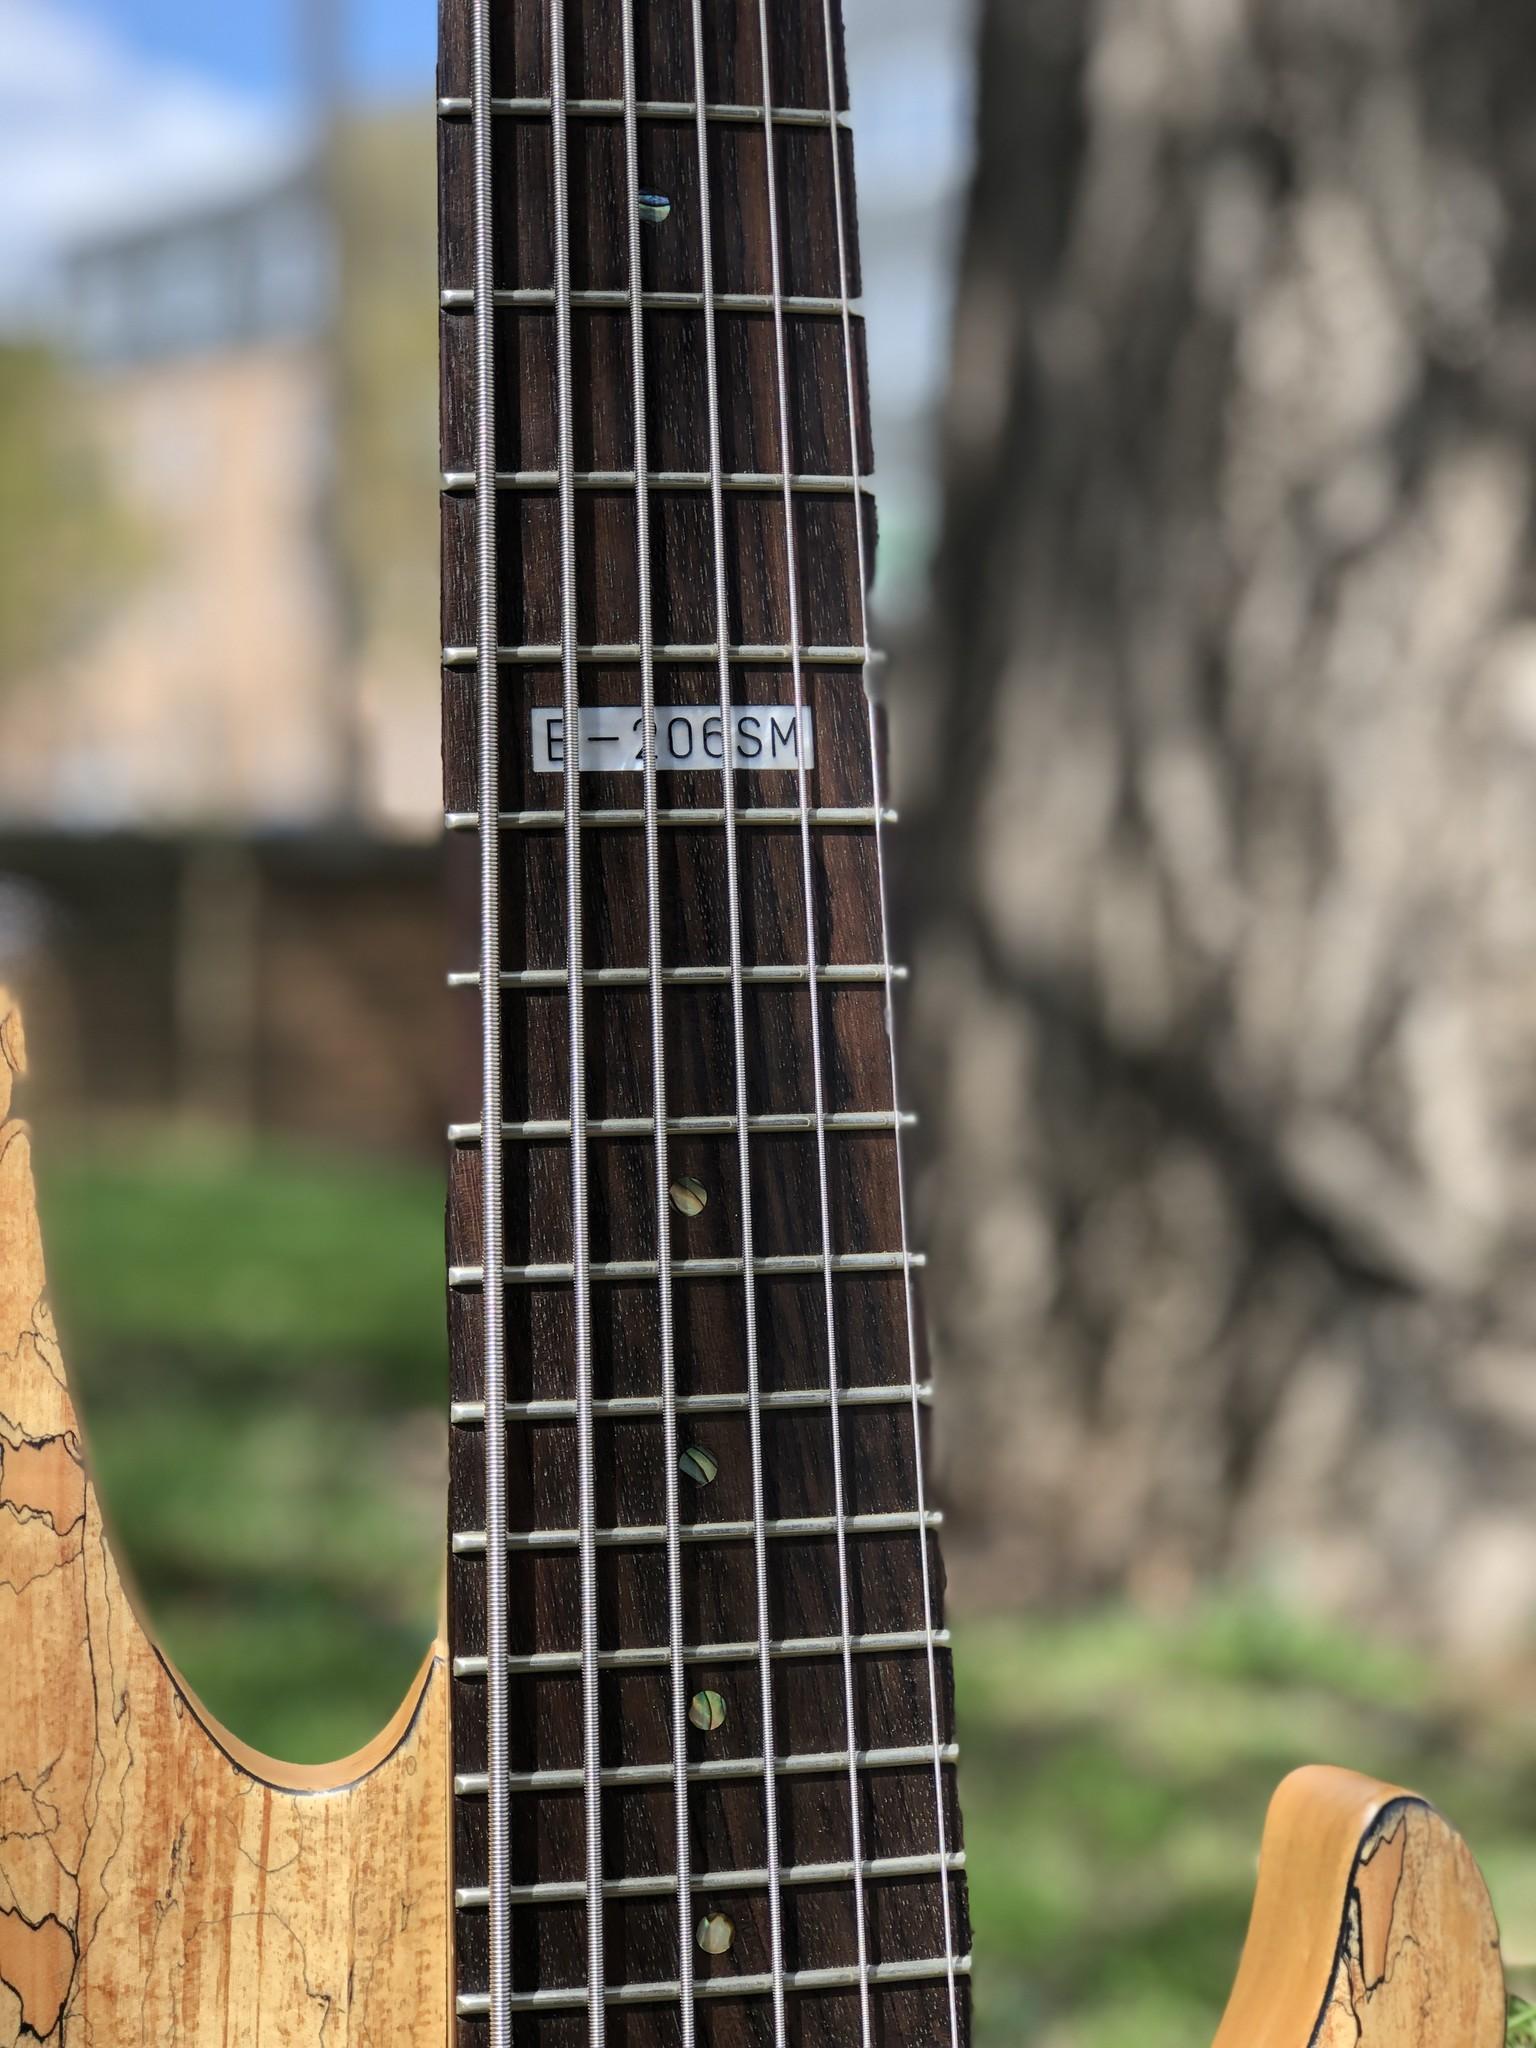 LTD by ESP B-206SM 6-string Bass-3